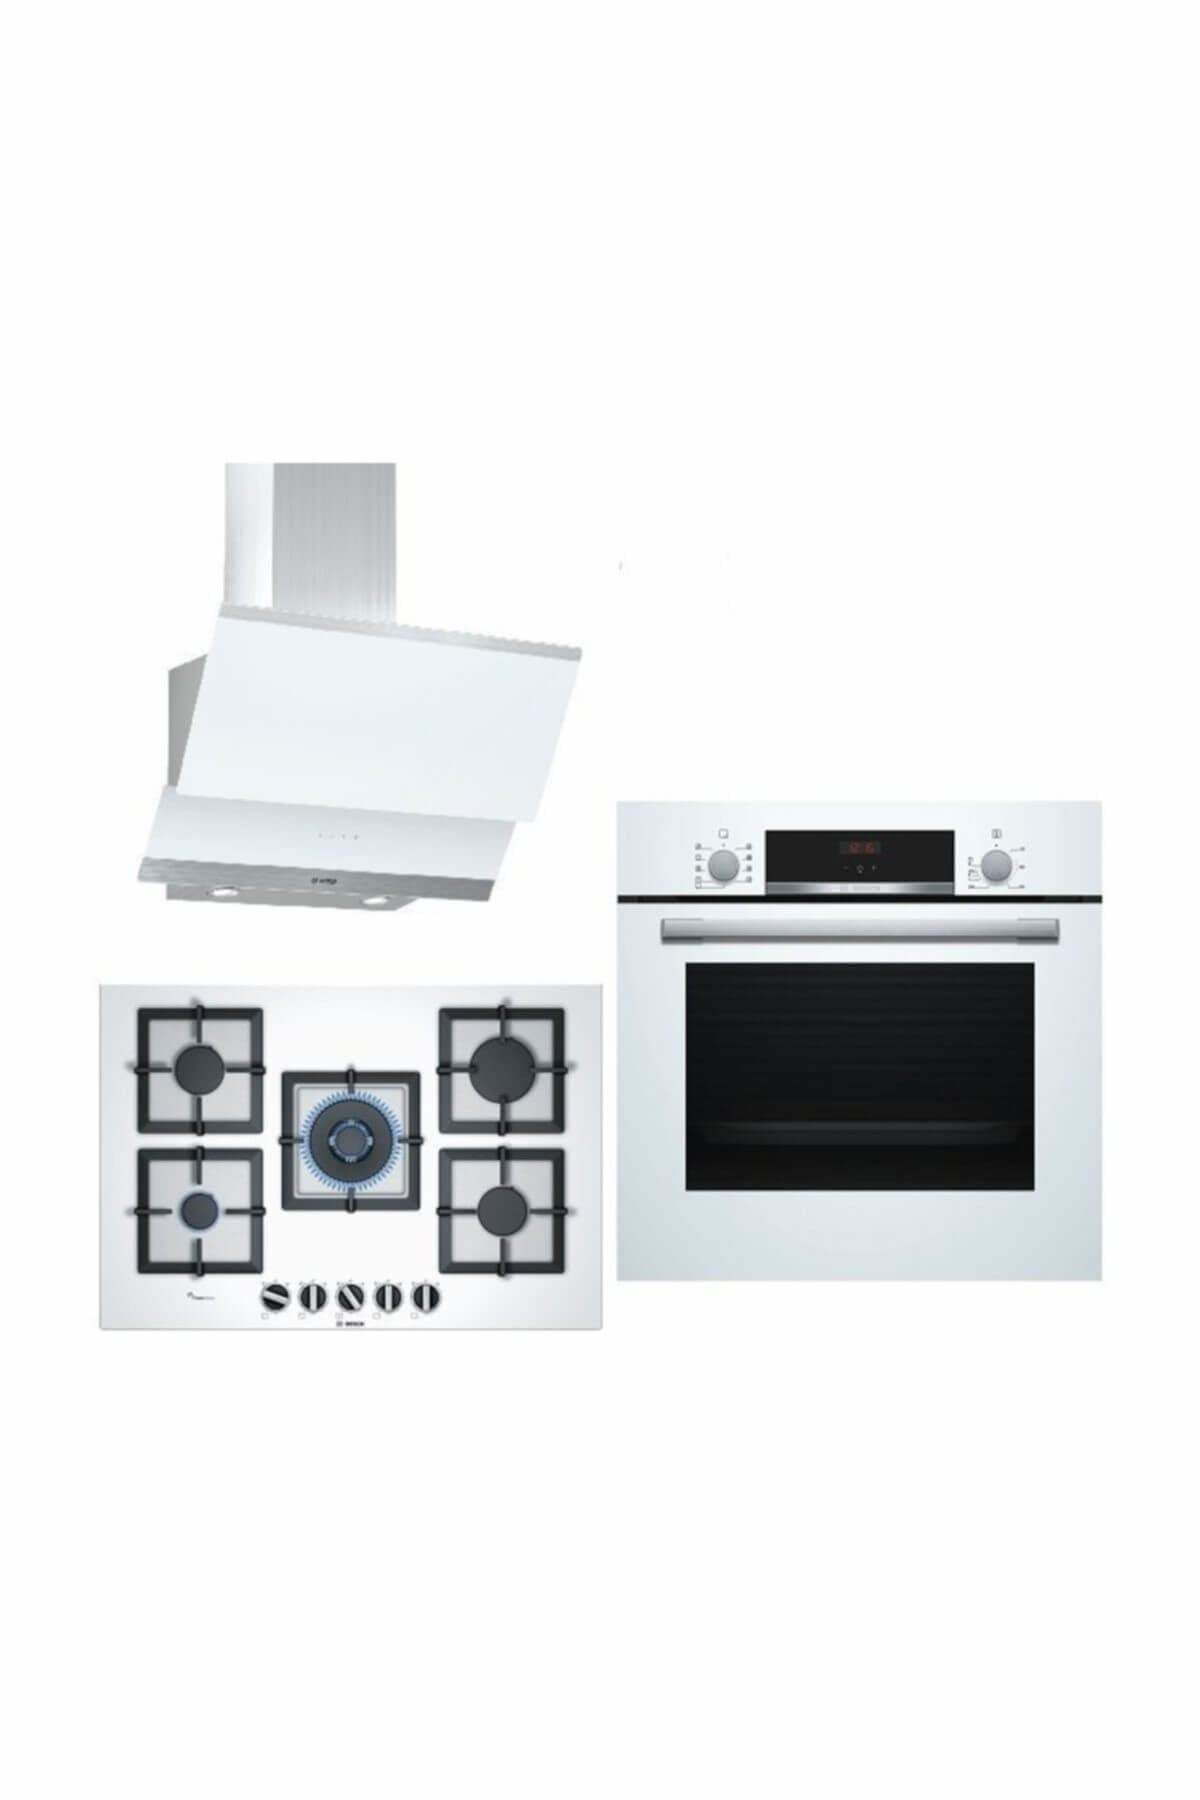 Bosch Ankastre Set50 (HBF534EW0T + PPQ7A2B20 + DWK065G20T) HBF534EW0T+PPQ7A2B20+DWK065G20T